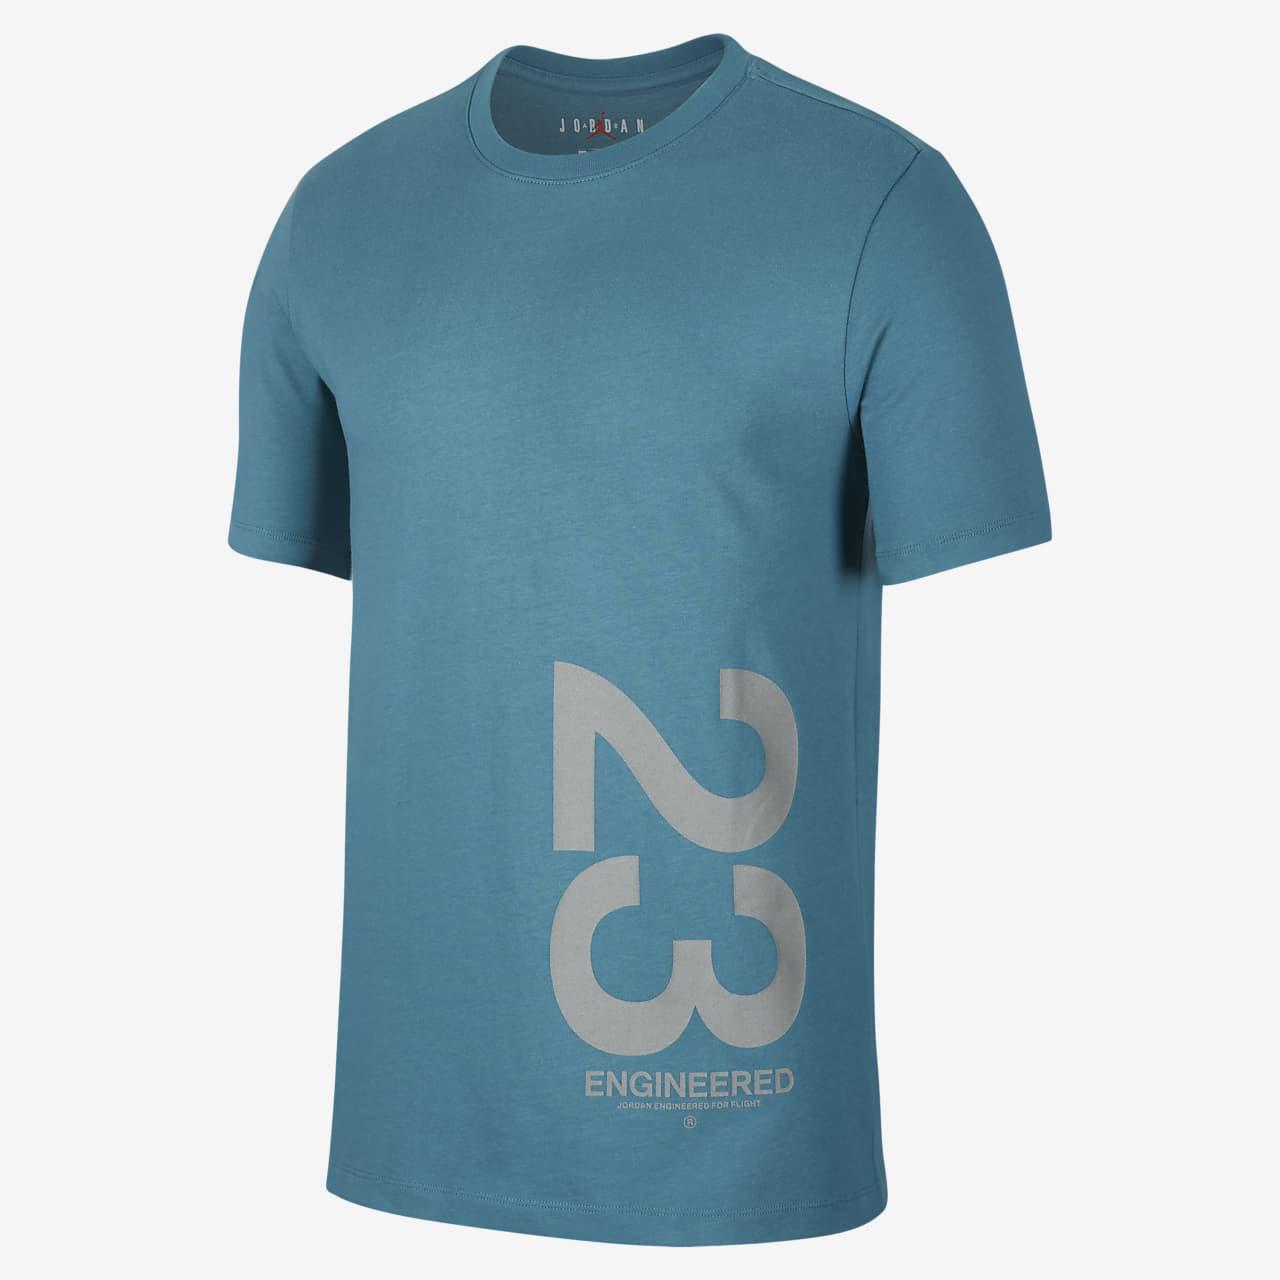 Jordan 23 Engineered T 恤